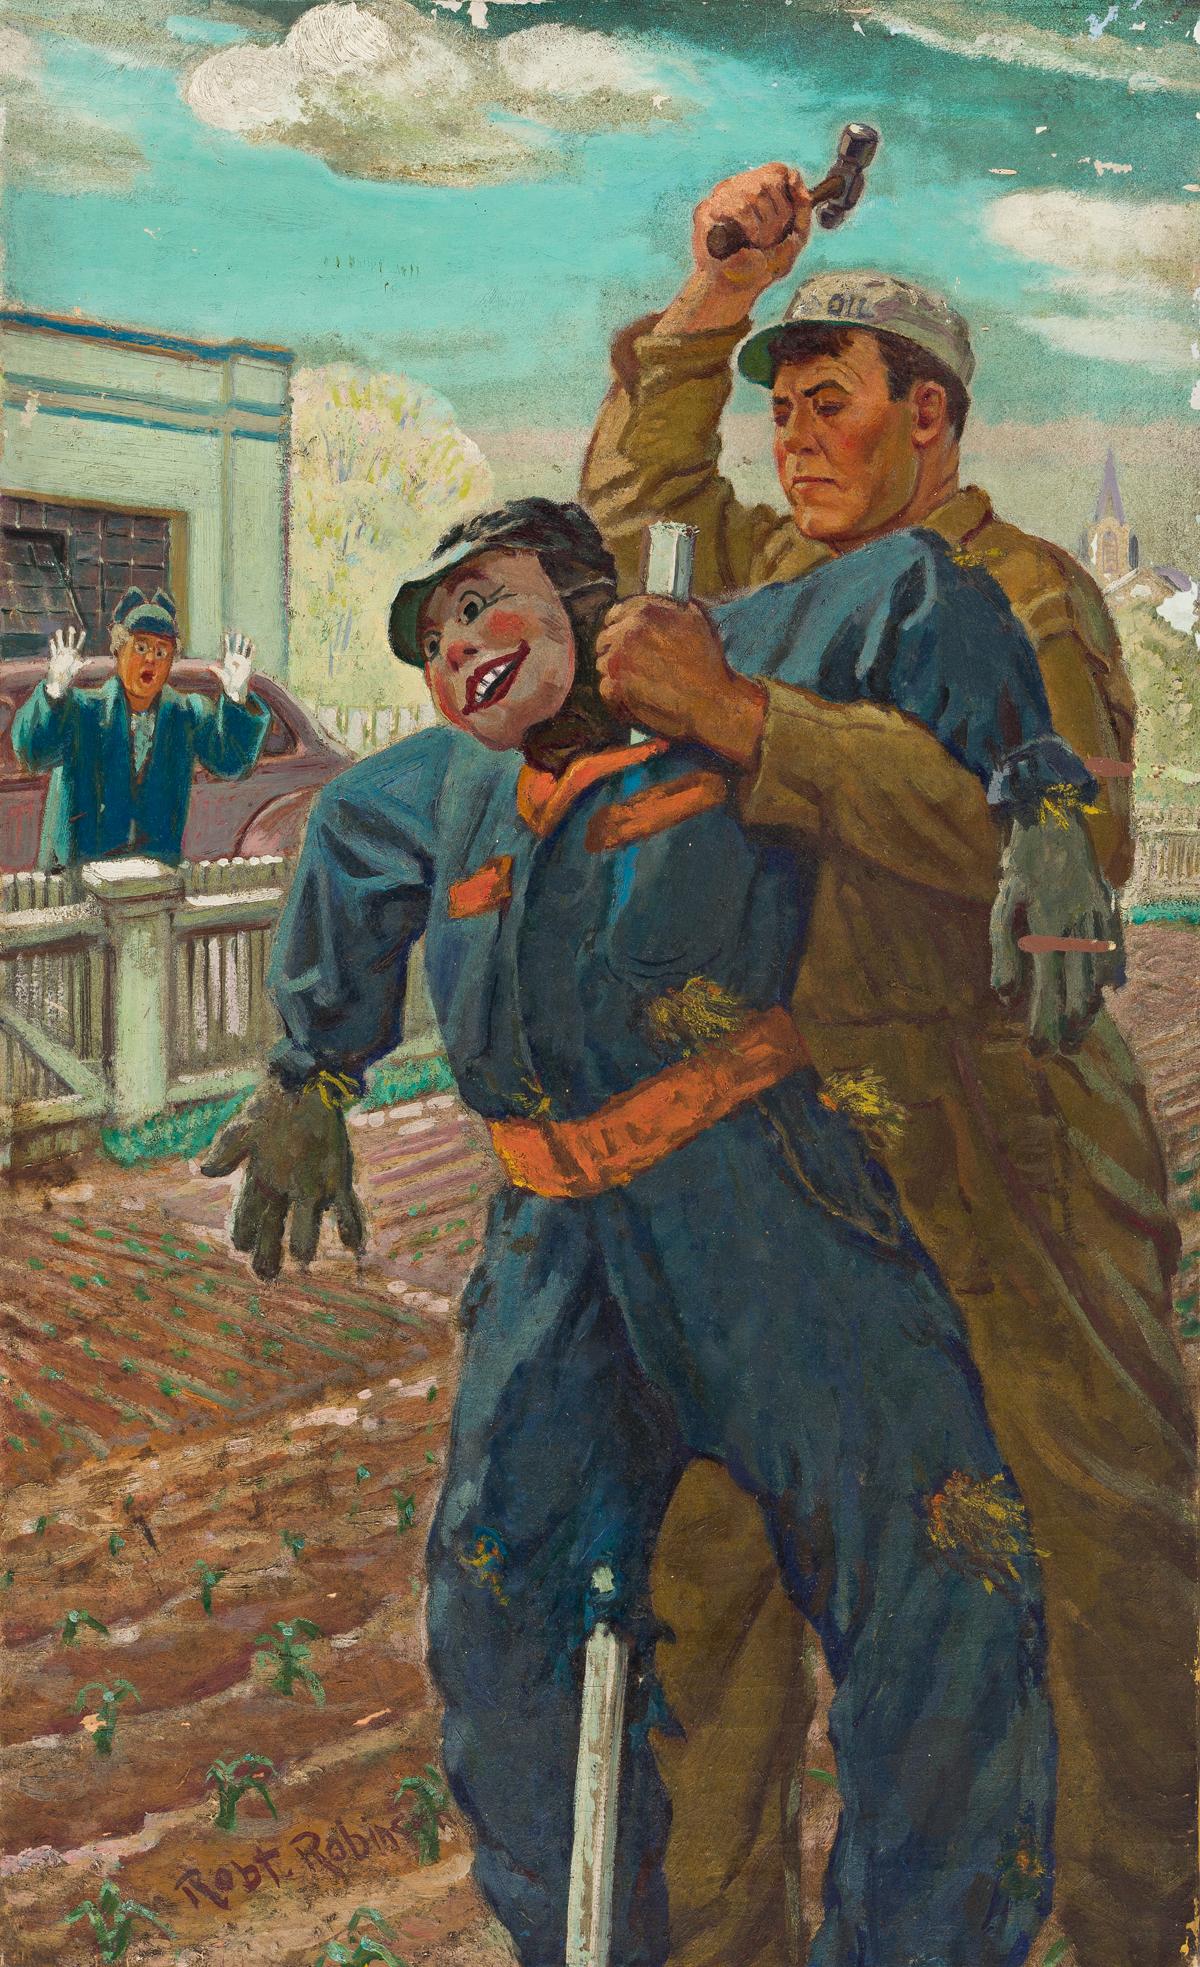 ROBERT BERNARD ROBINSON (1886-1952) Scarecrow. [COVER ART / MOTOR MAGAZINE / AUTOMOBILES]